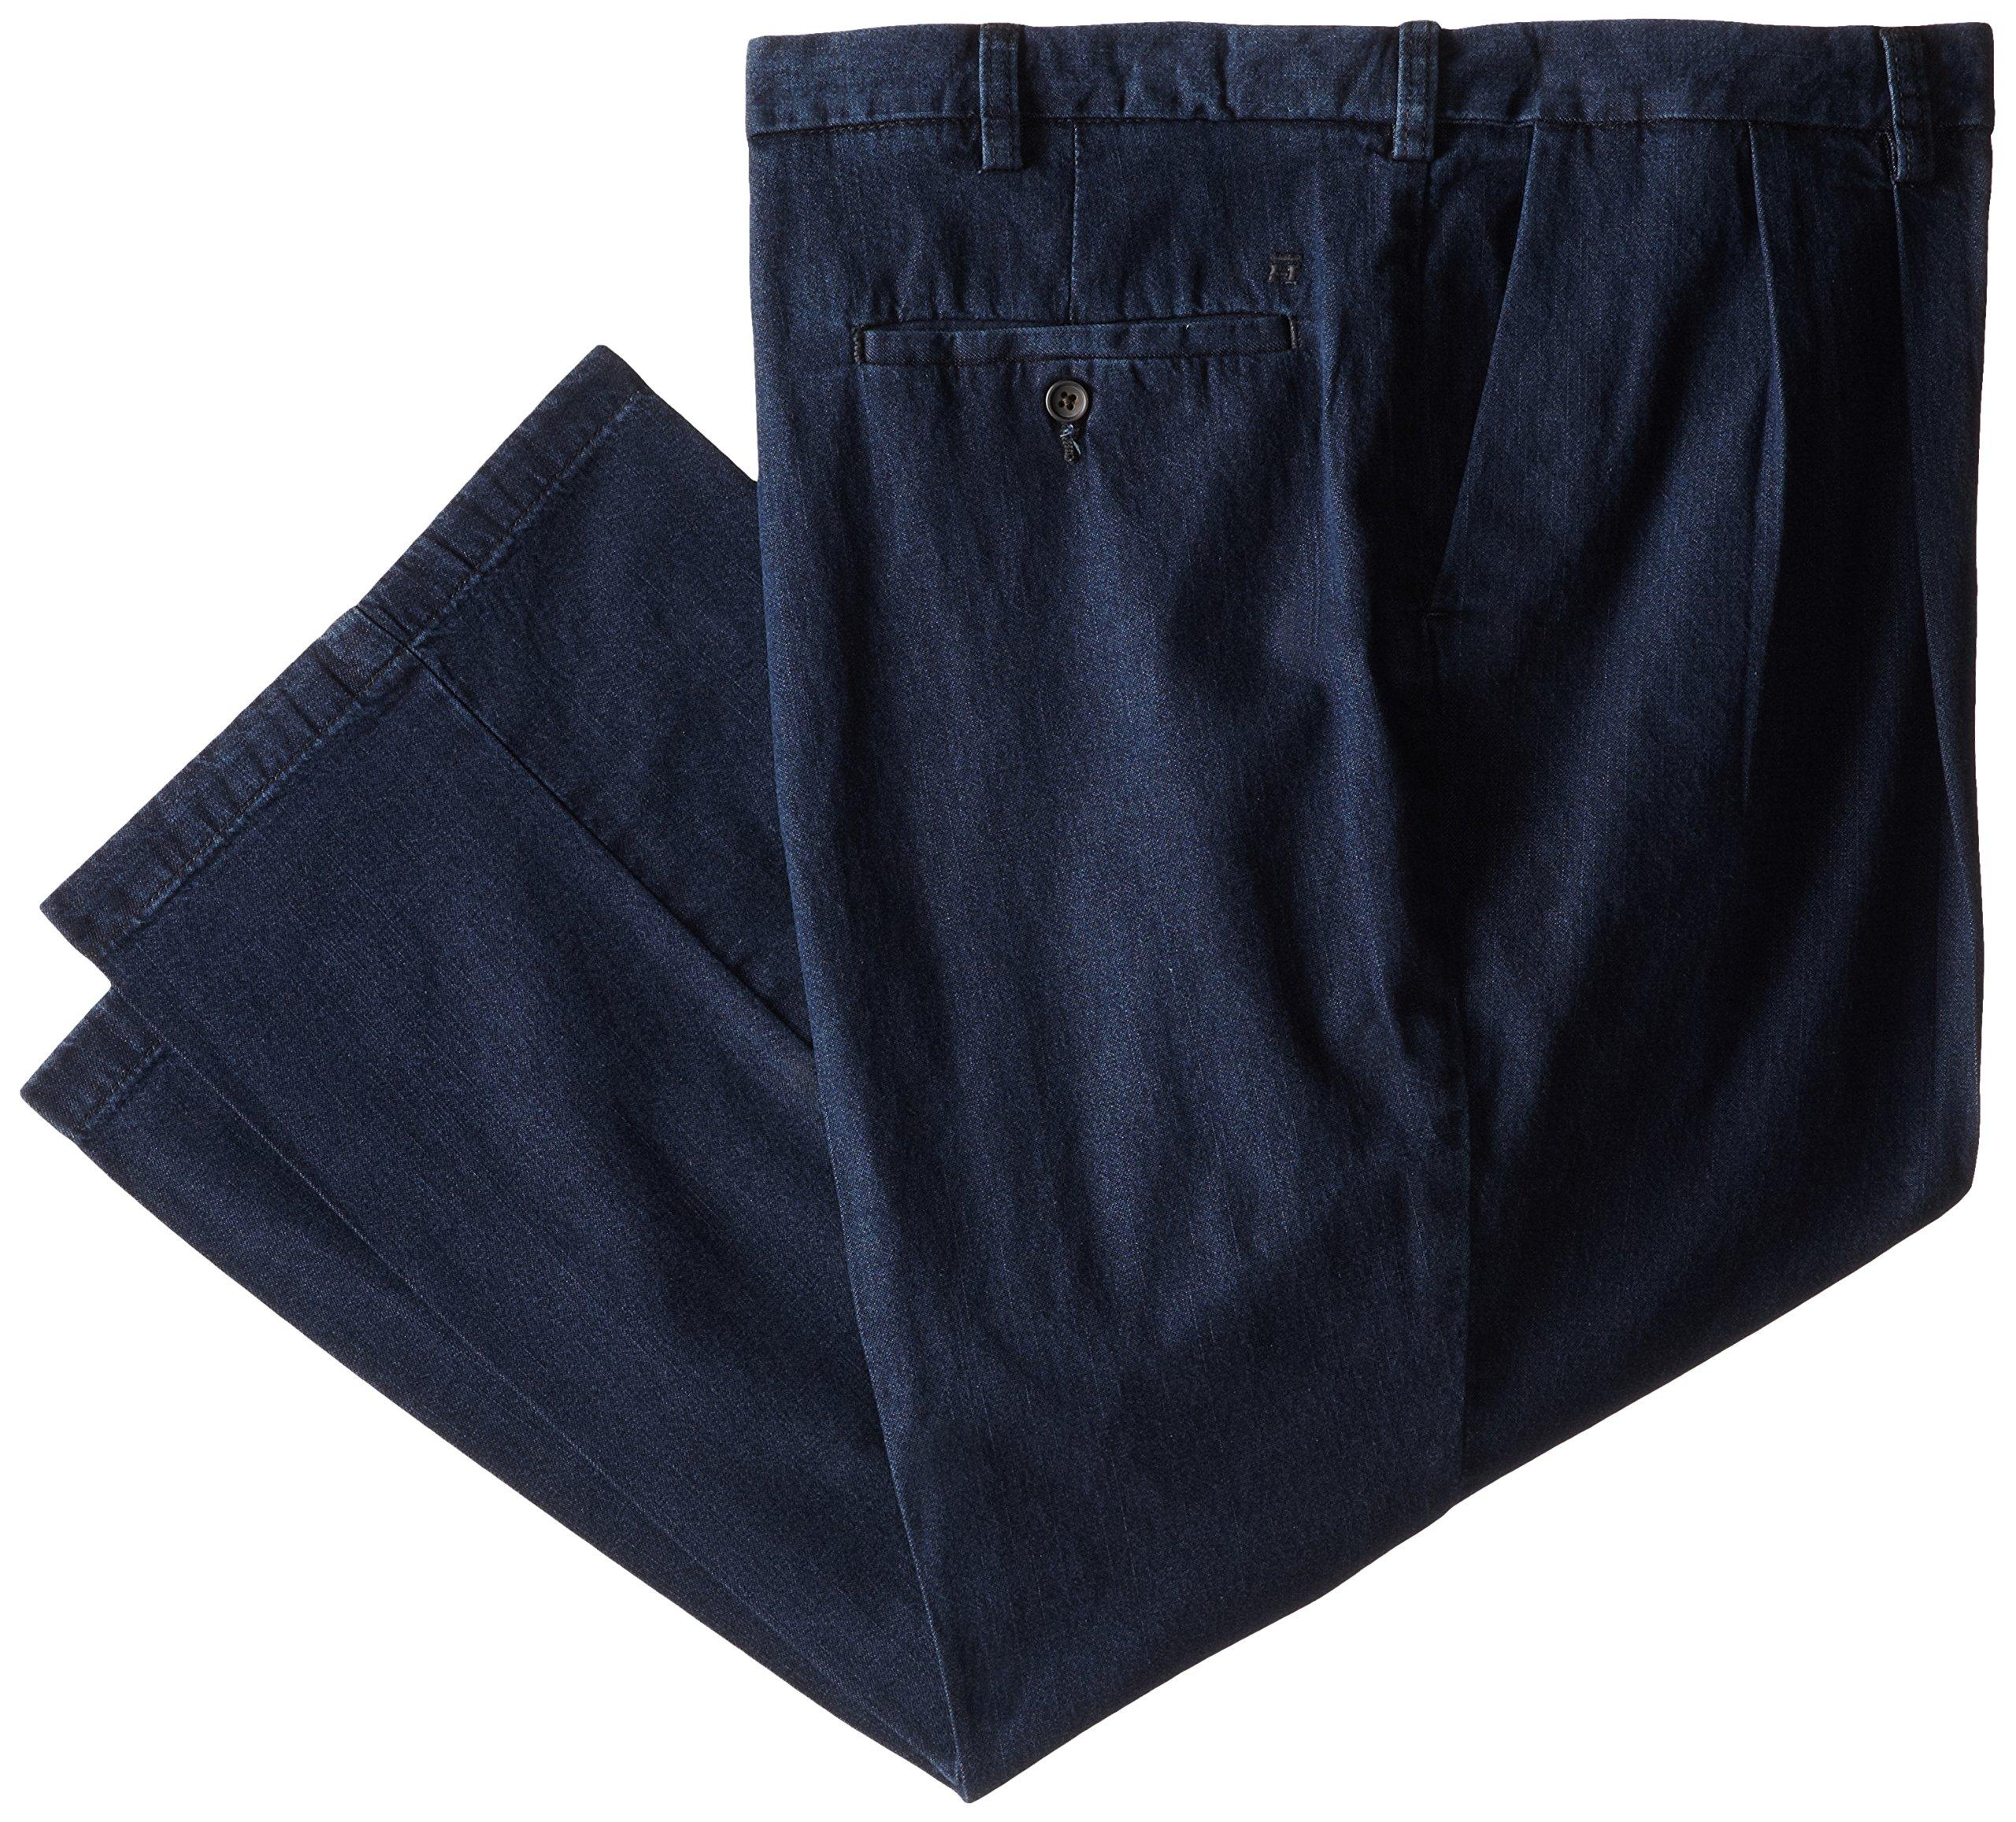 Haggar Men's Big-Tall Work To Weekend Expandable Waist Dark Denim Pant, Navy, 52x34